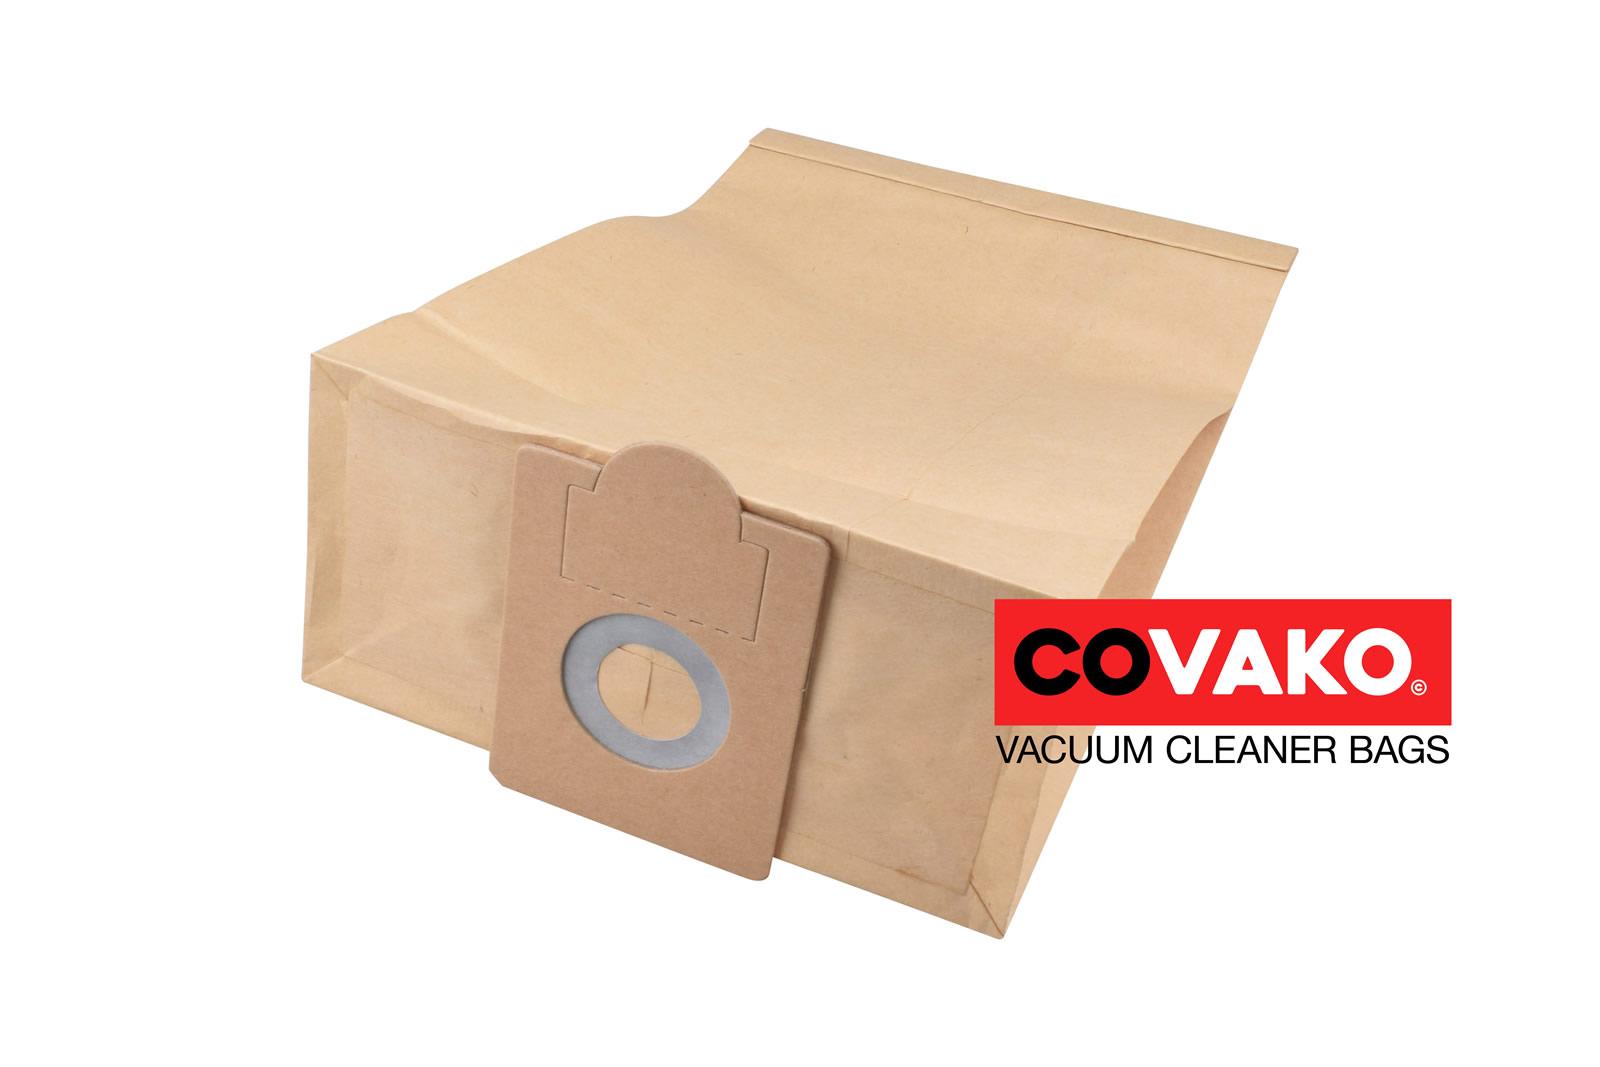 Fakir S 12 / Papier - Fakir sacs d'aspirateur